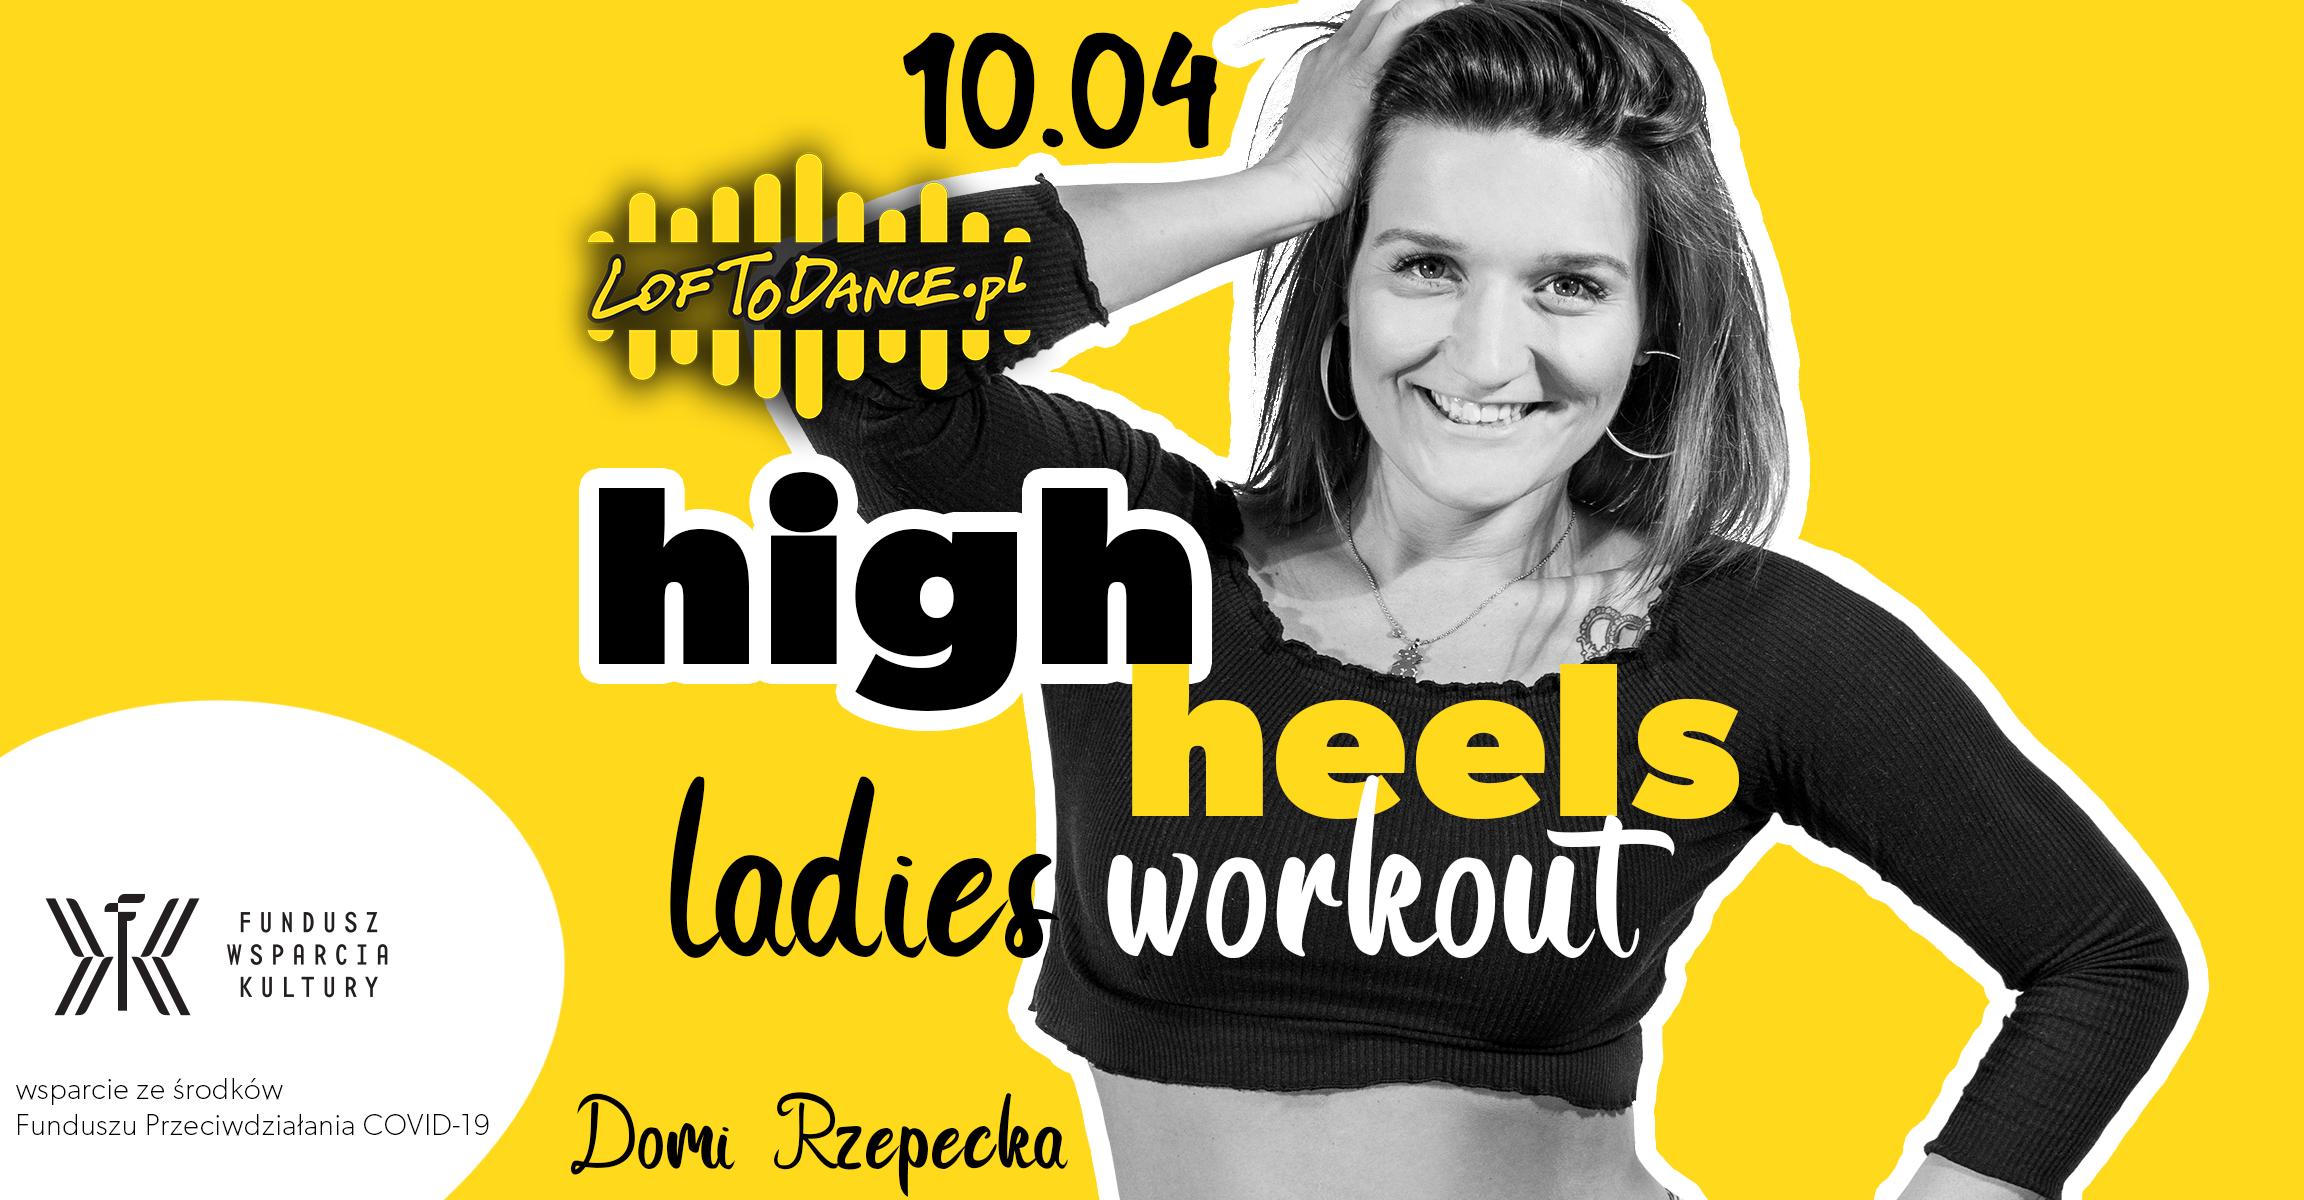 High Heels Ladies Workout